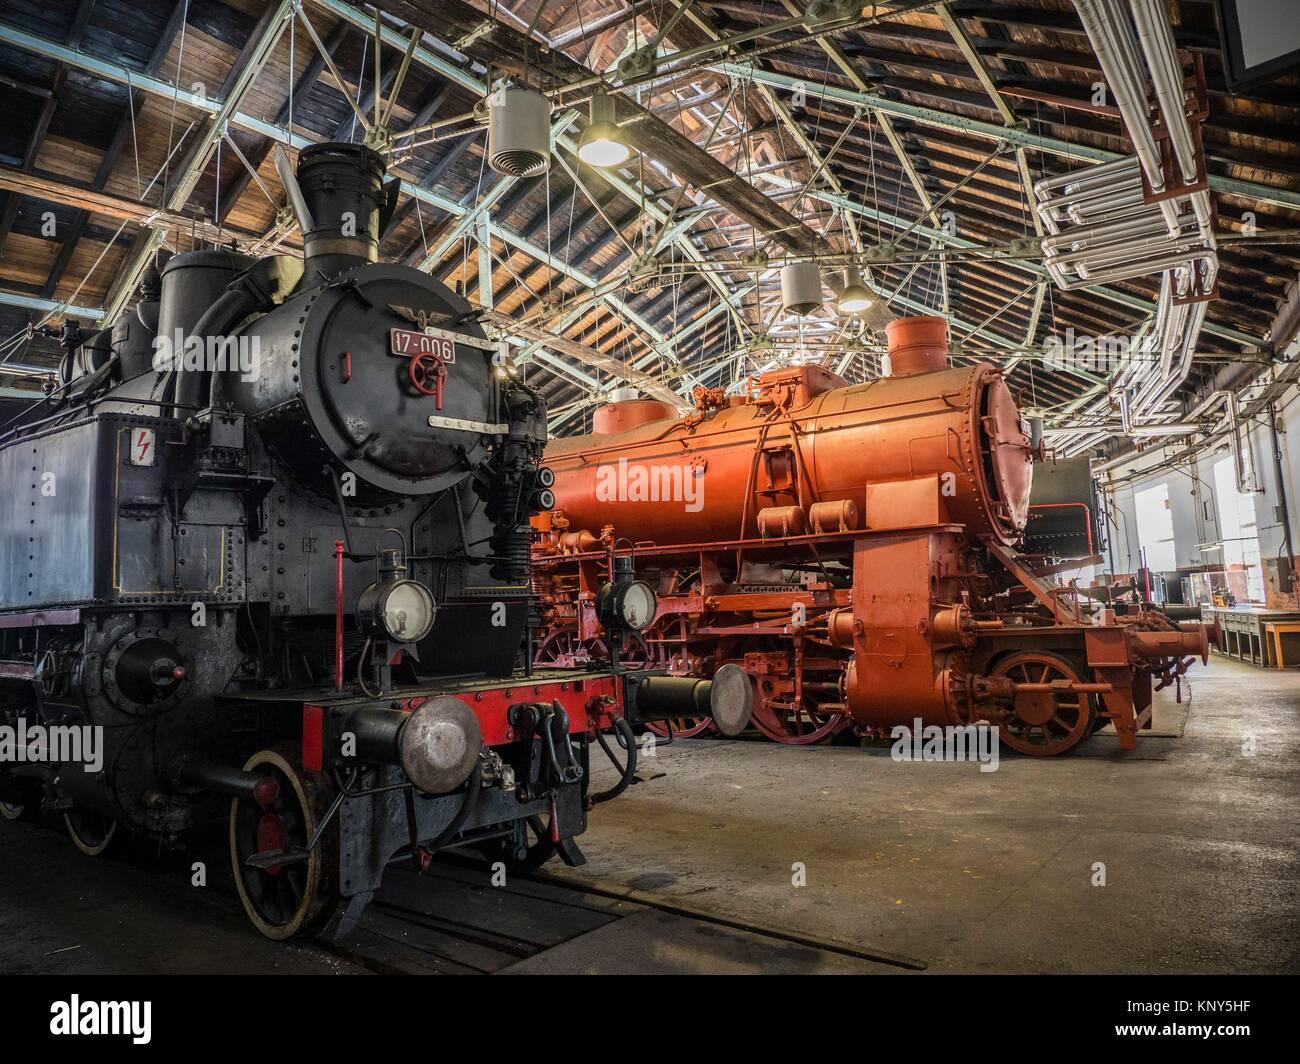 Slovenia Ljubljana Train Museum Locomotive. - Stock Image